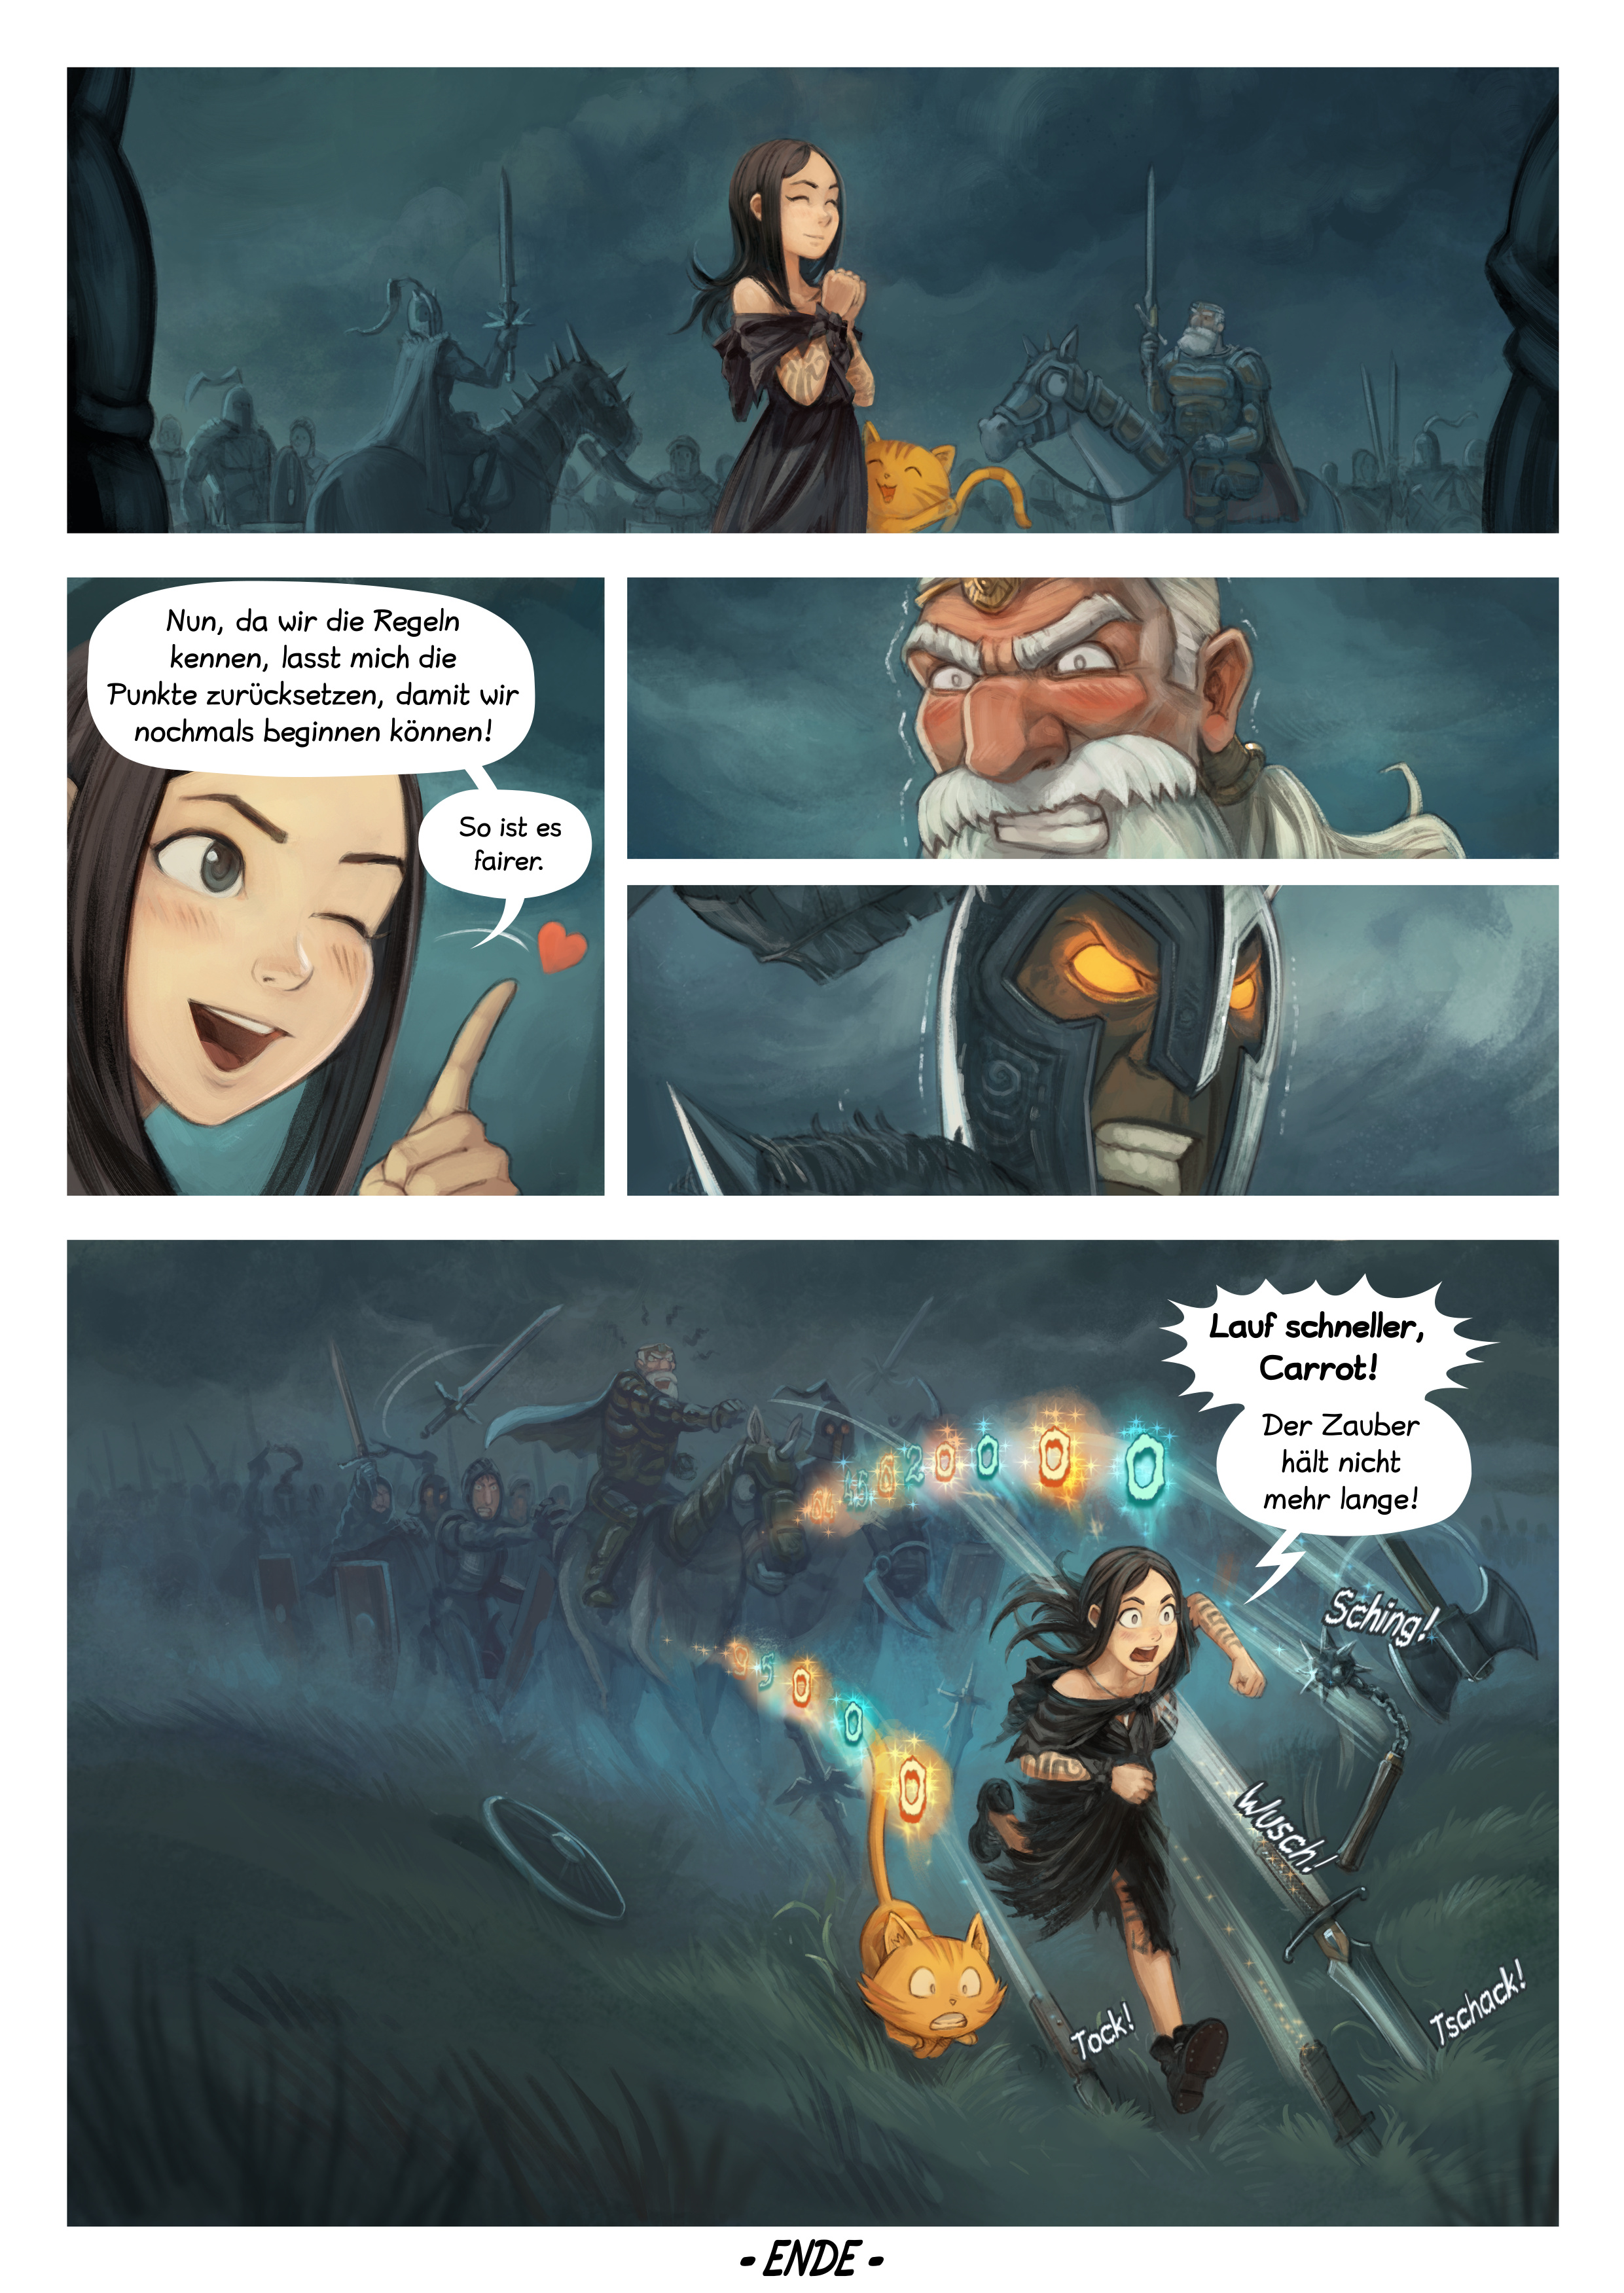 Episode 33: Zauberhafter Krieg, Page 8